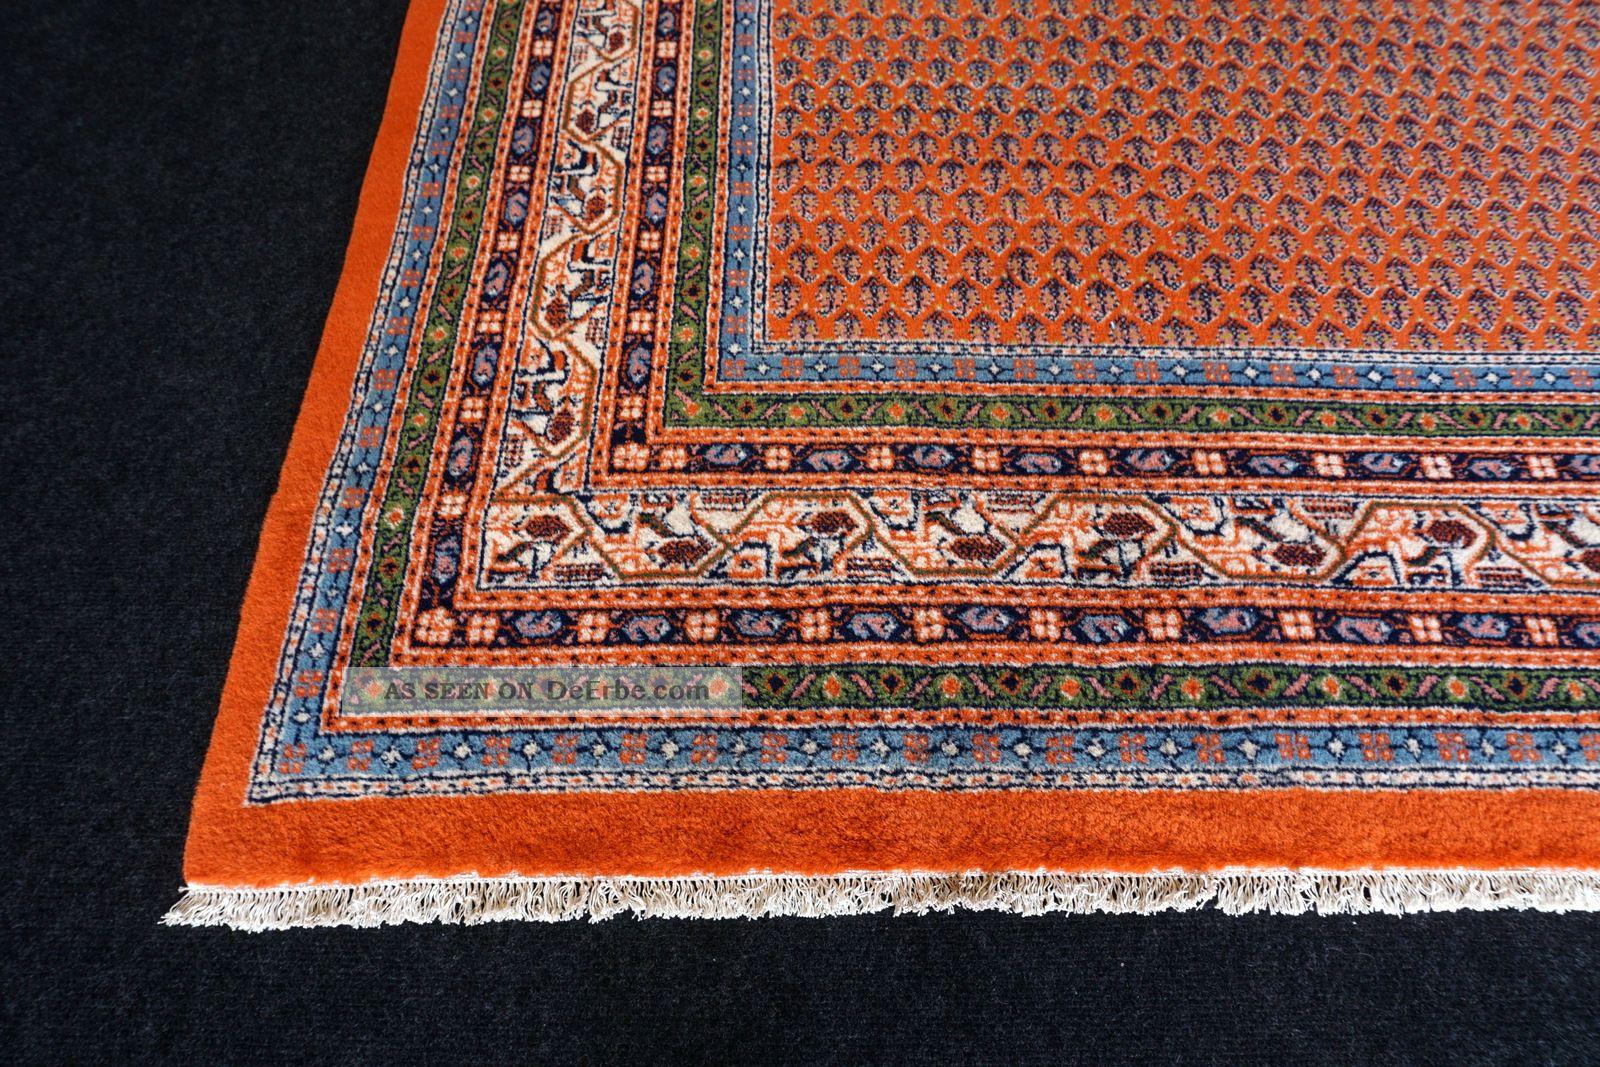 orient teppich indo mir 300 x 200 cm rotrost handgekn pft red carpet rug tappeto. Black Bedroom Furniture Sets. Home Design Ideas